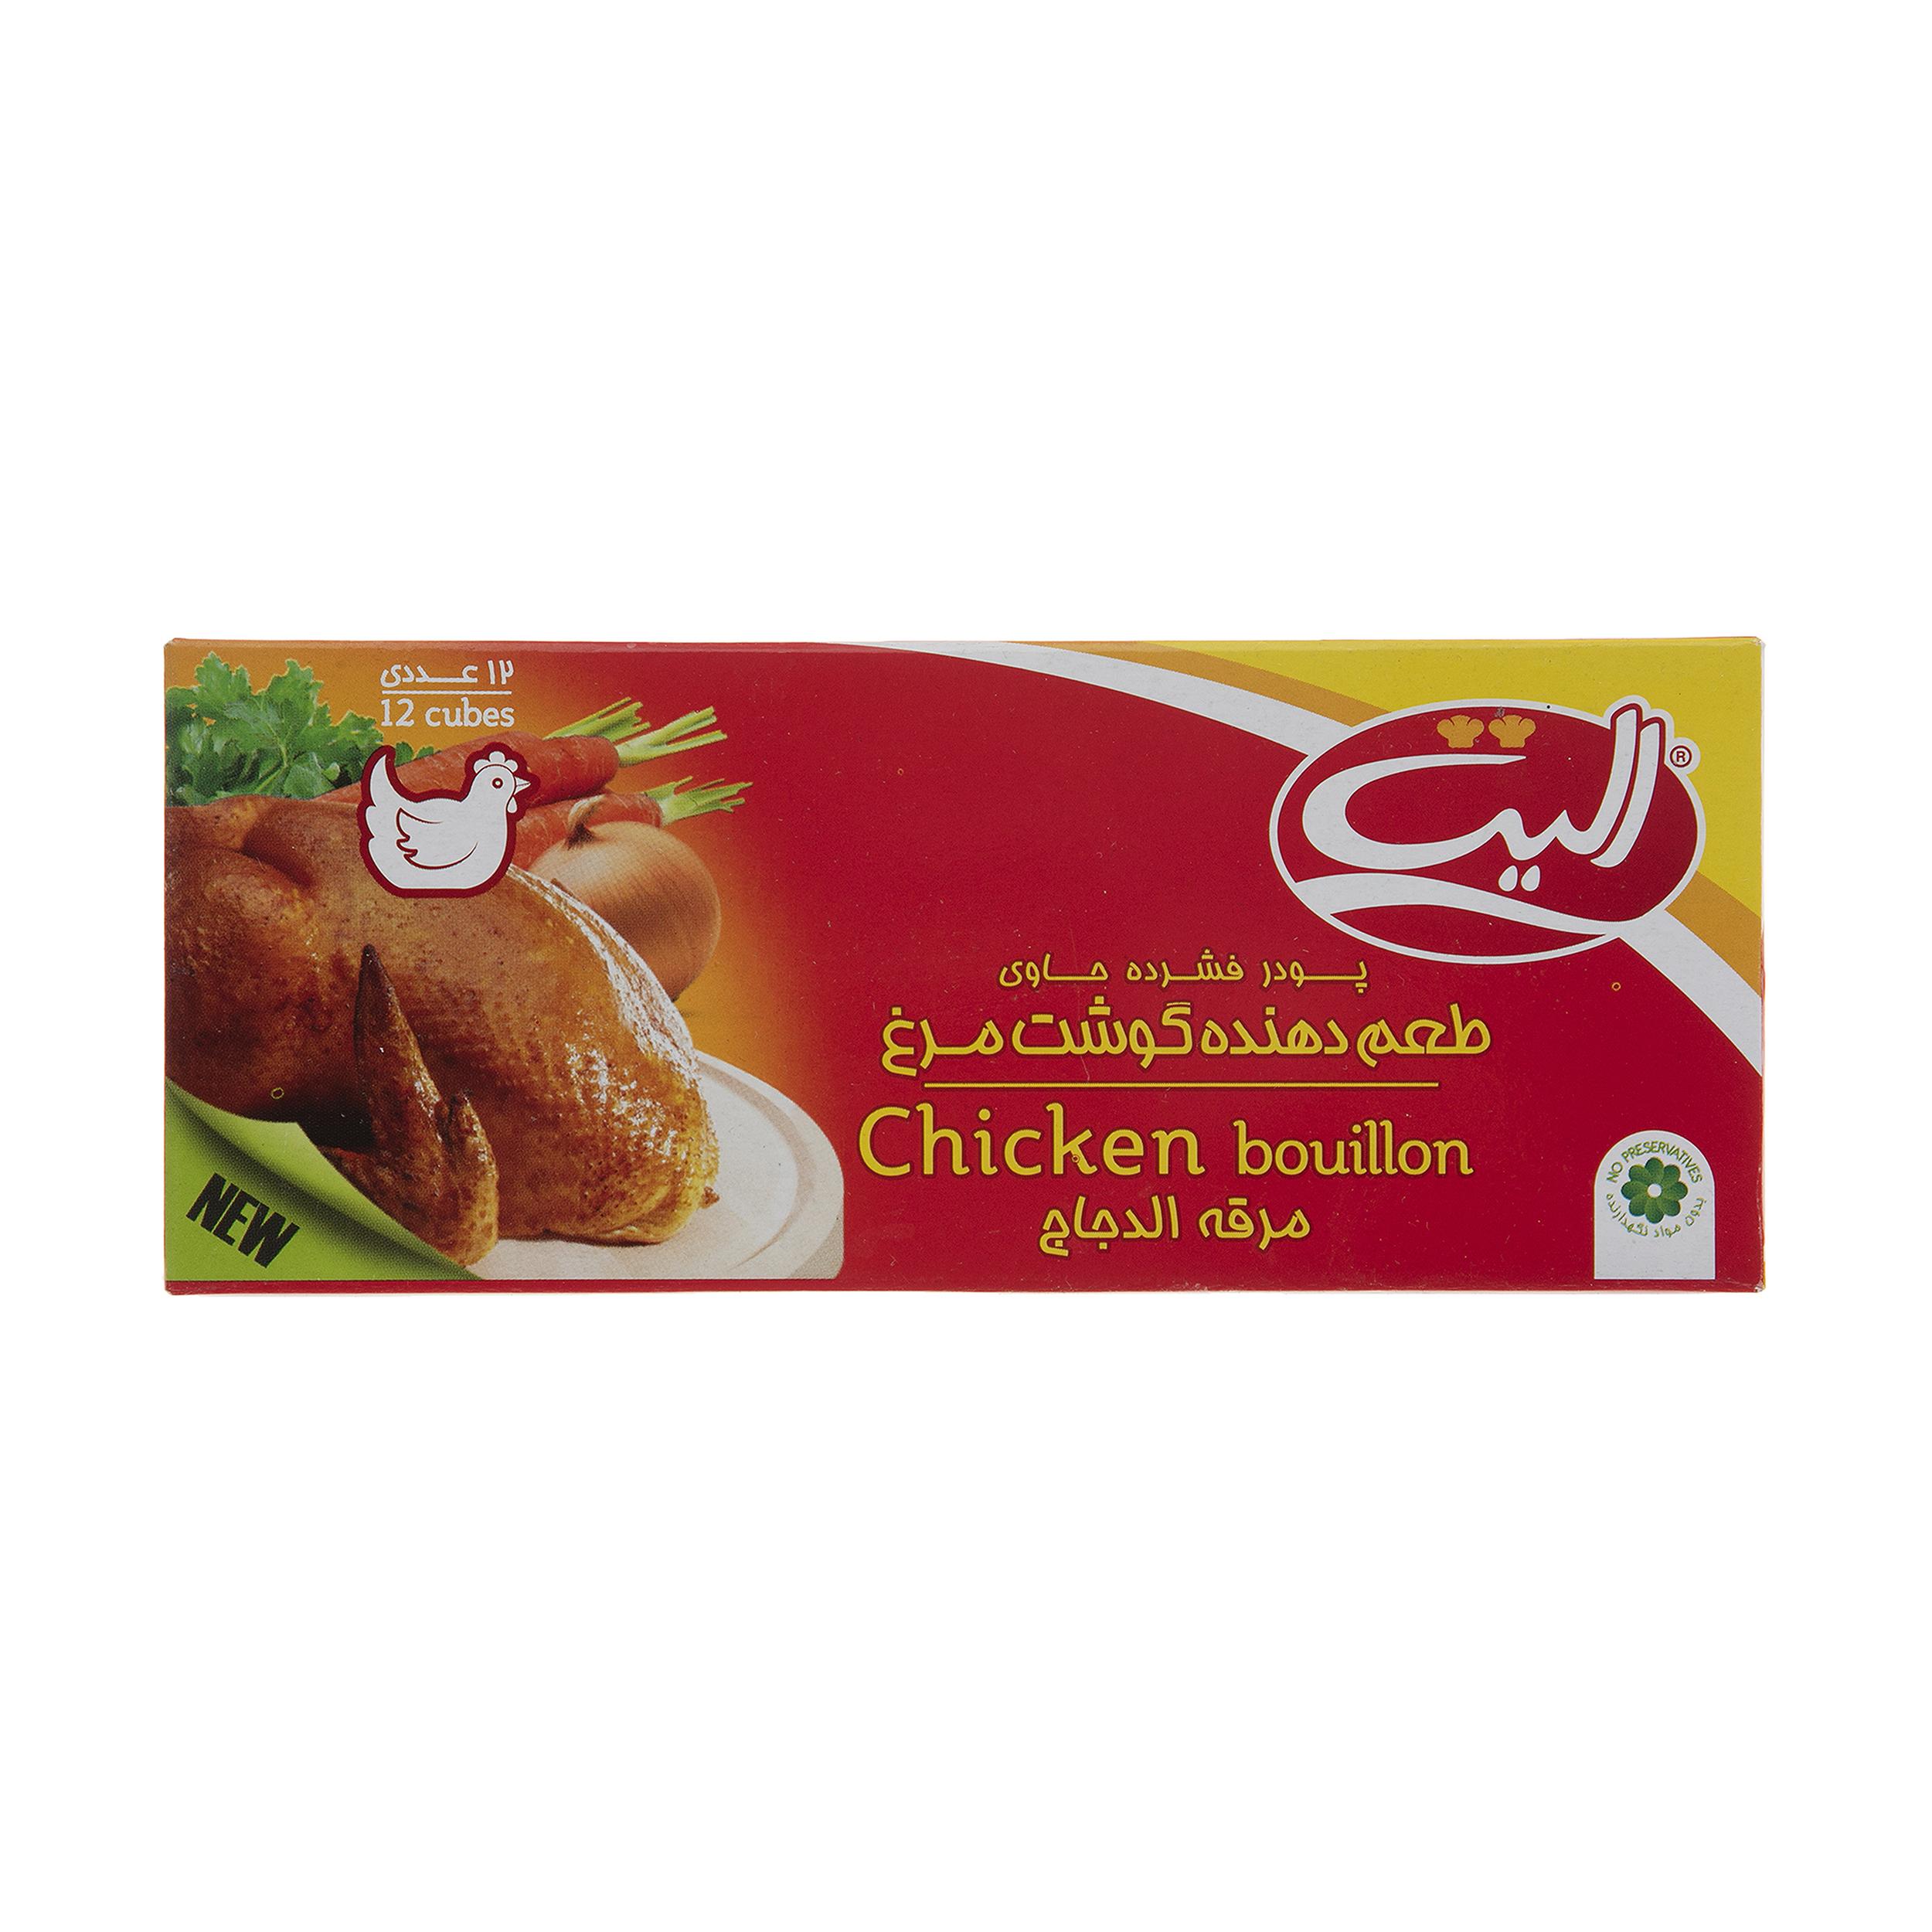 پودر عصاره گوشت مرغ الیت مقدار 120 گرم